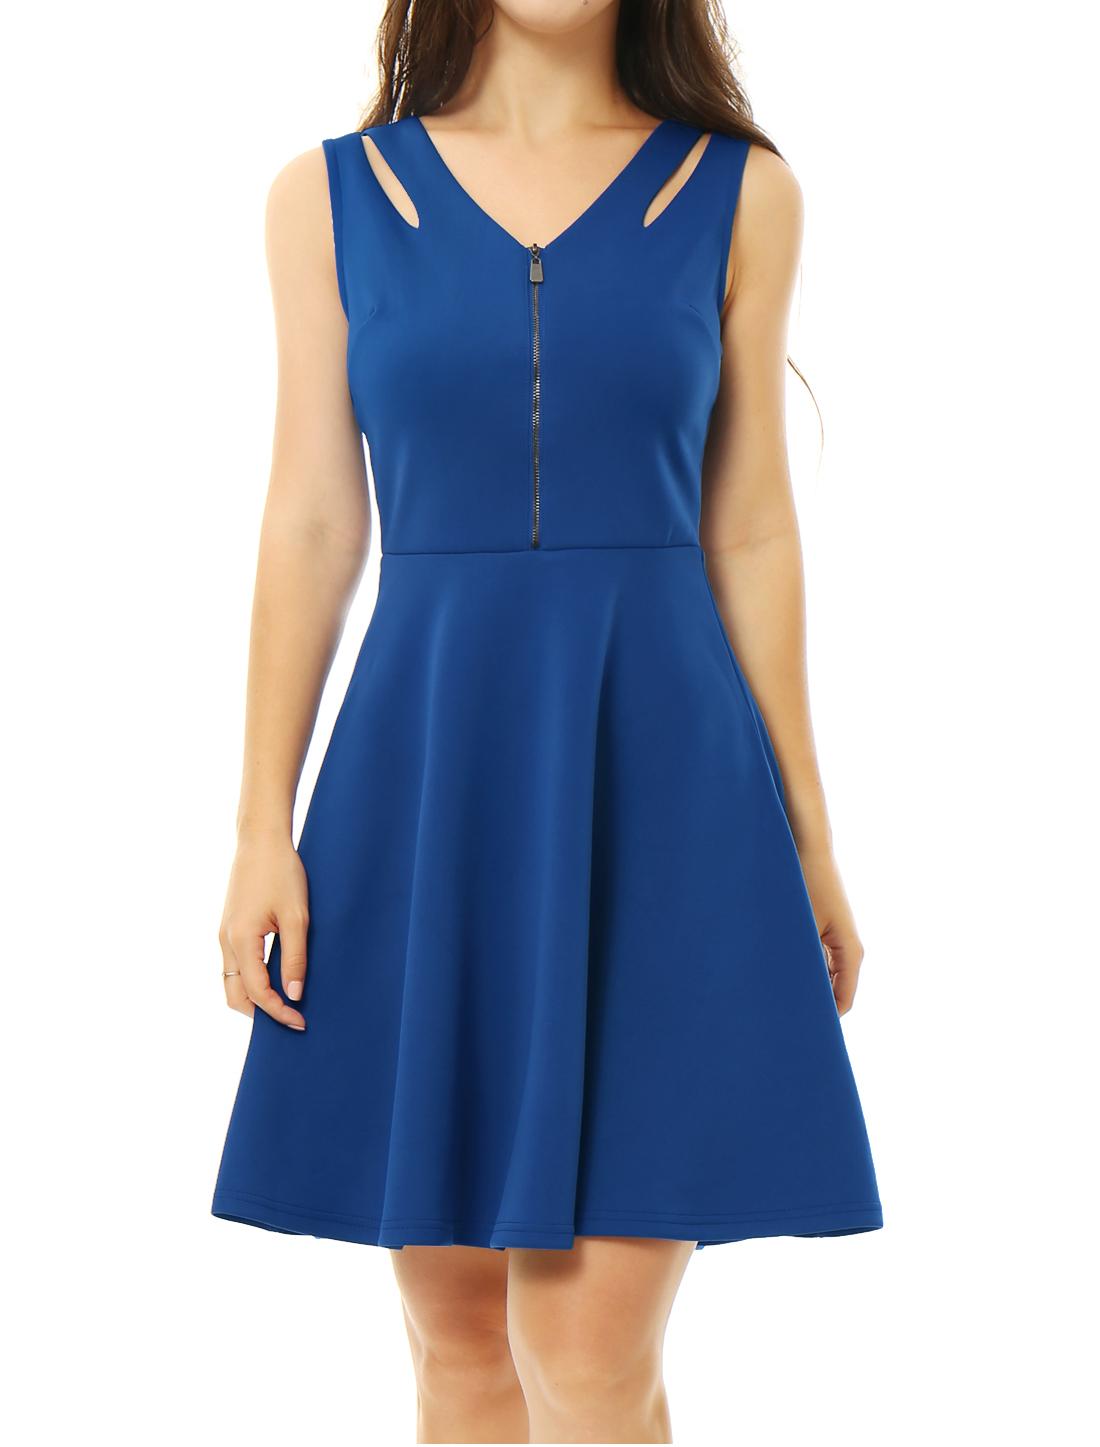 Women V Neck Half Zipper Front Cut Out A Line Dress Blue XS